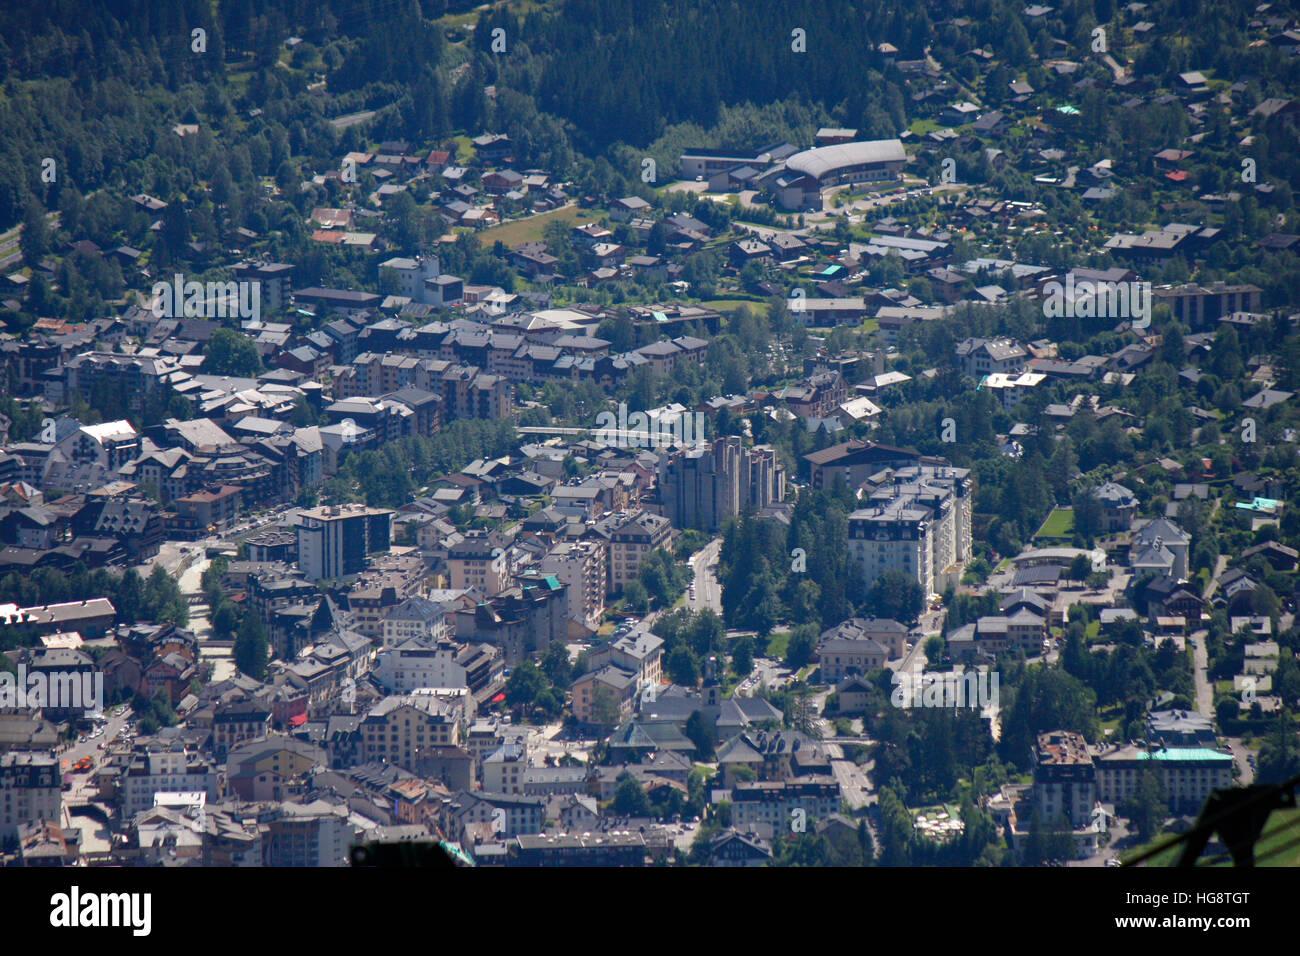 Luftbild: Chamonix, Frankreich. - Stock Image